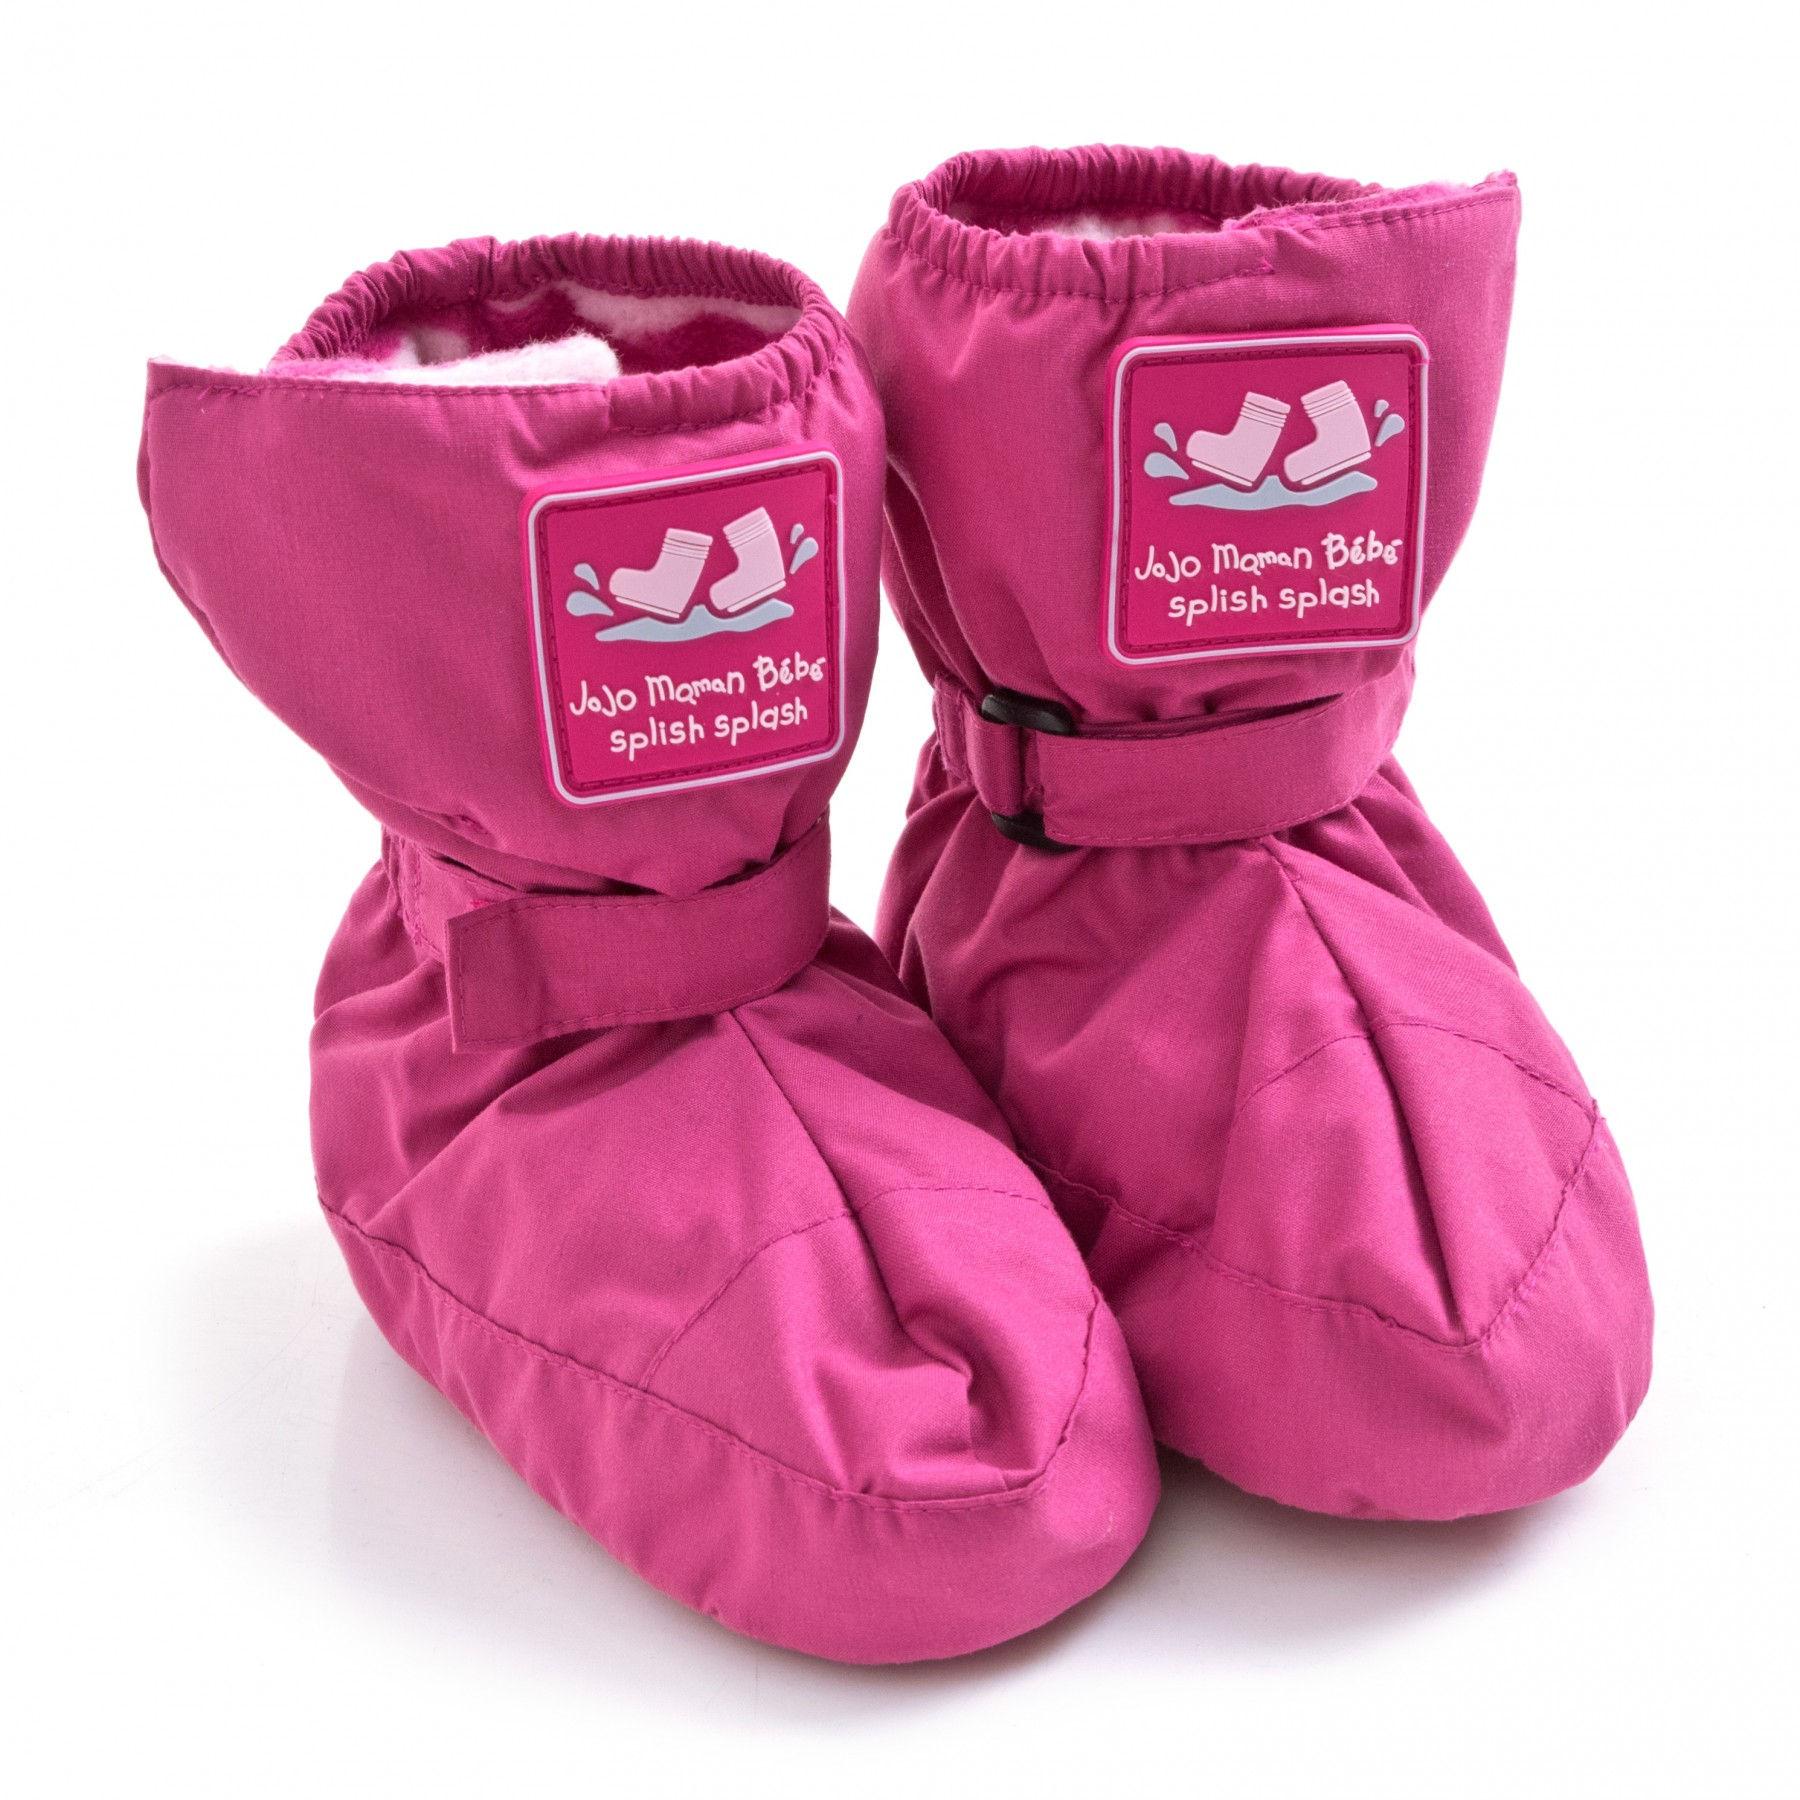 ba0e47bf6b296 ... JoJo Maman Bebe Girl s Fleece Lined Booties - Fuchsia - Size  0-6  Months ...